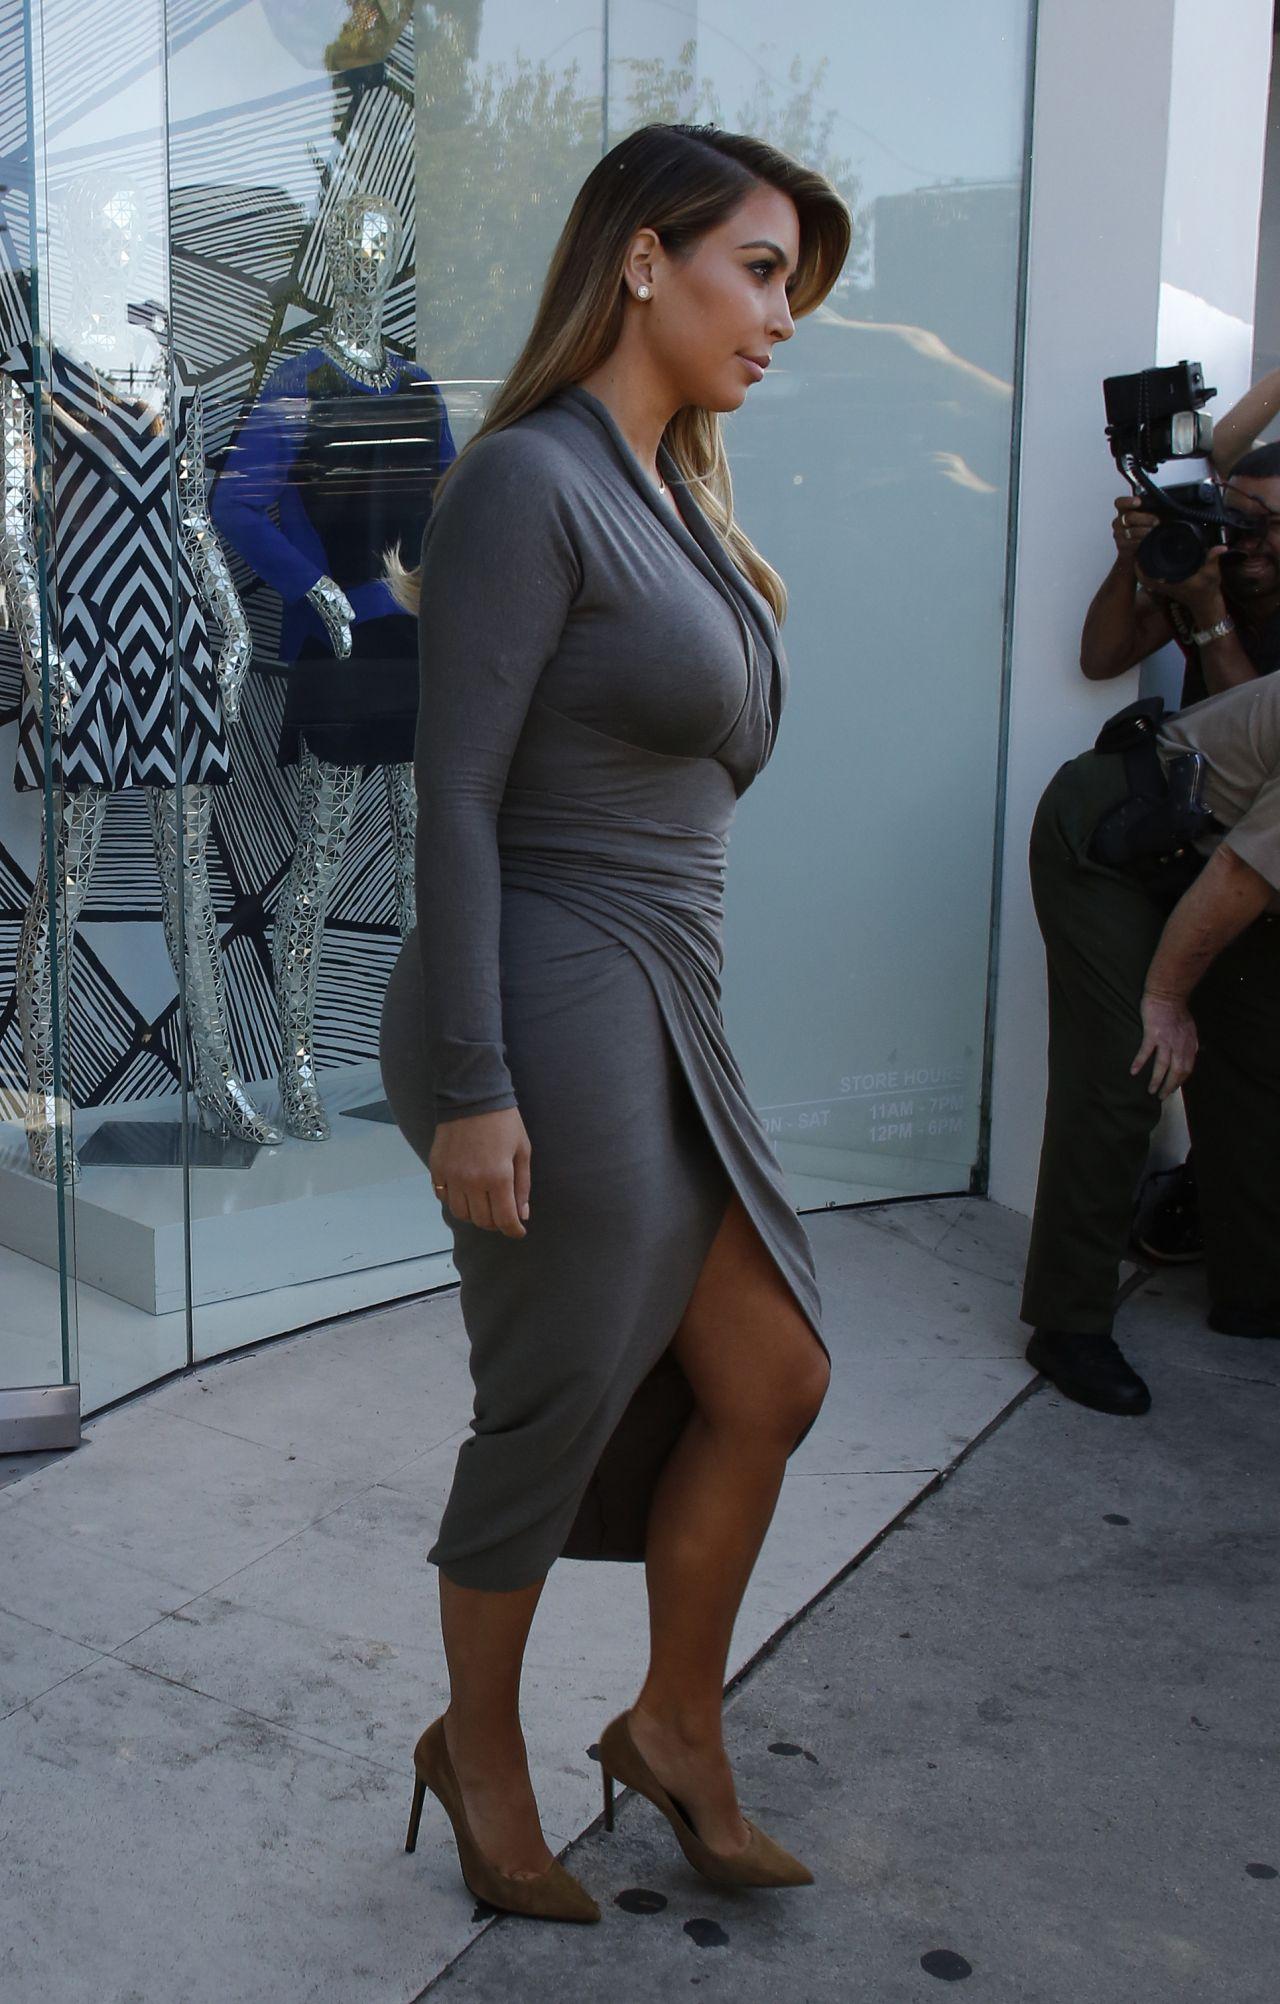 Kim Kardashian Busty In A Dress At Dash Boutique In West